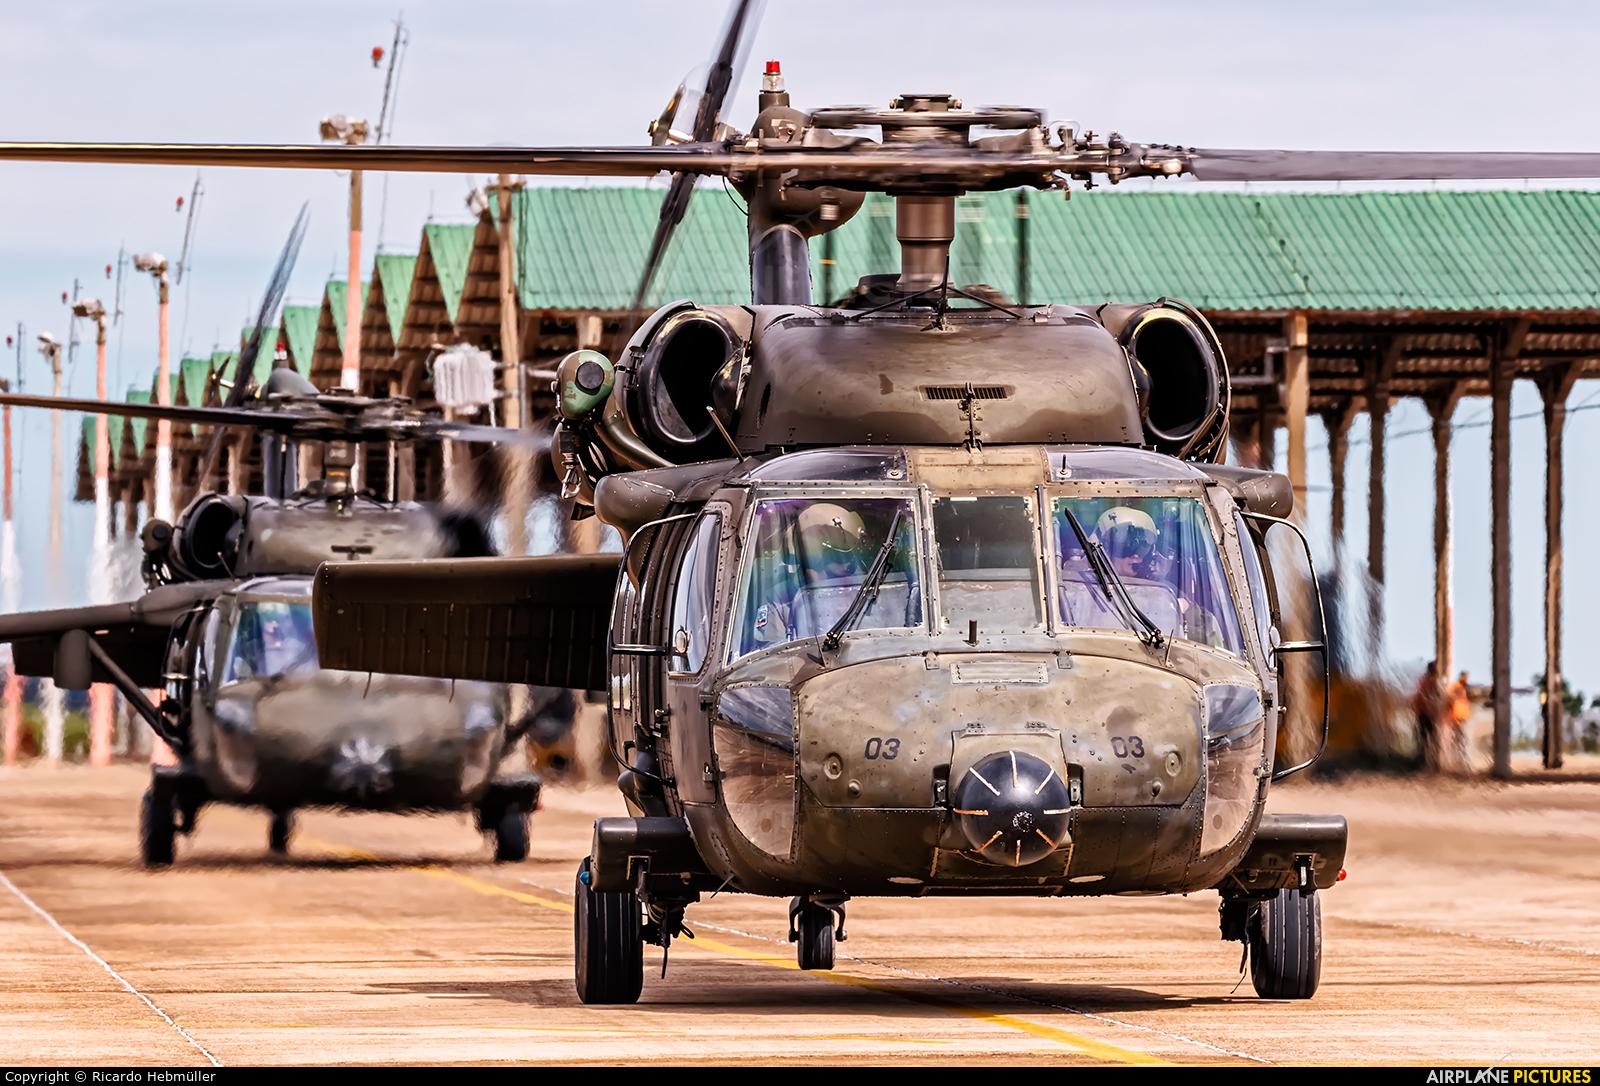 Brazil - Air Force 8903 aircraft at Campo Grande